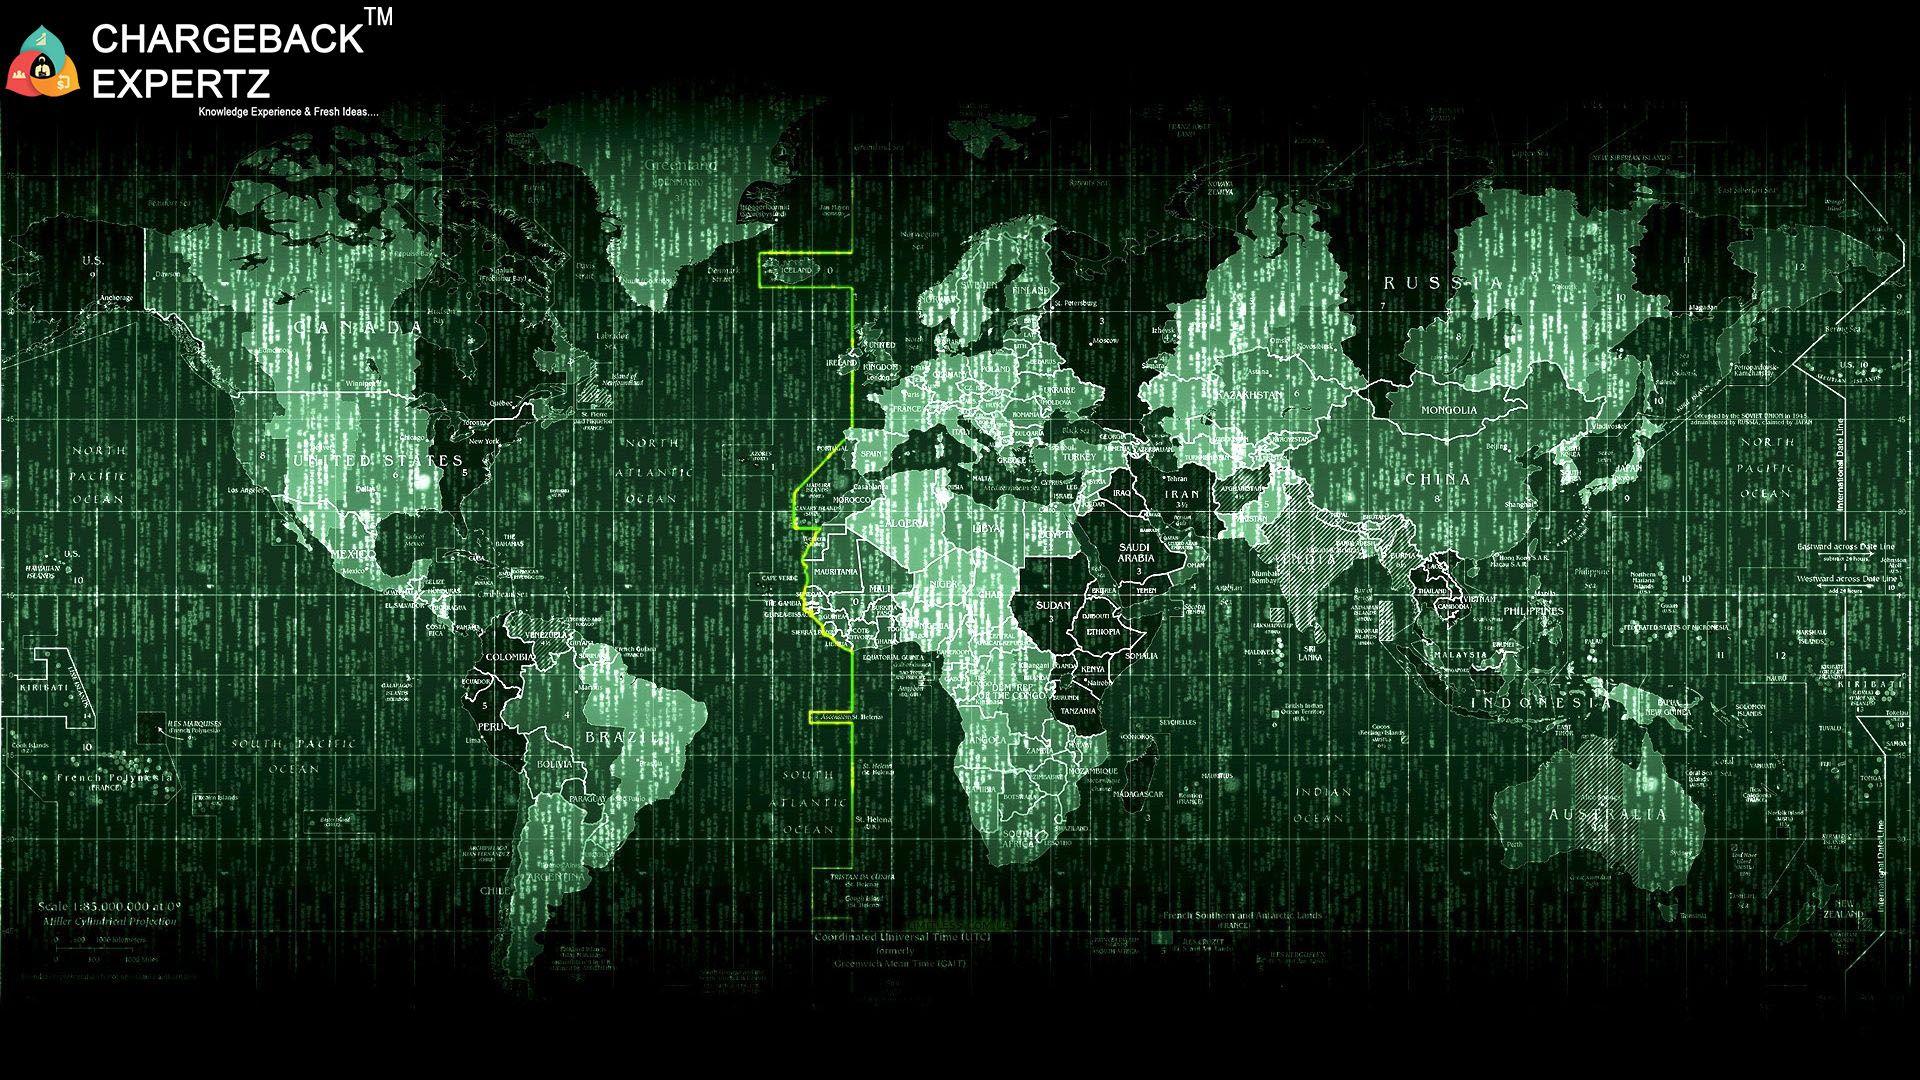 E Commerce And Chargbacks World Map Wallpaper Code Wallpaper Map Wallpaper